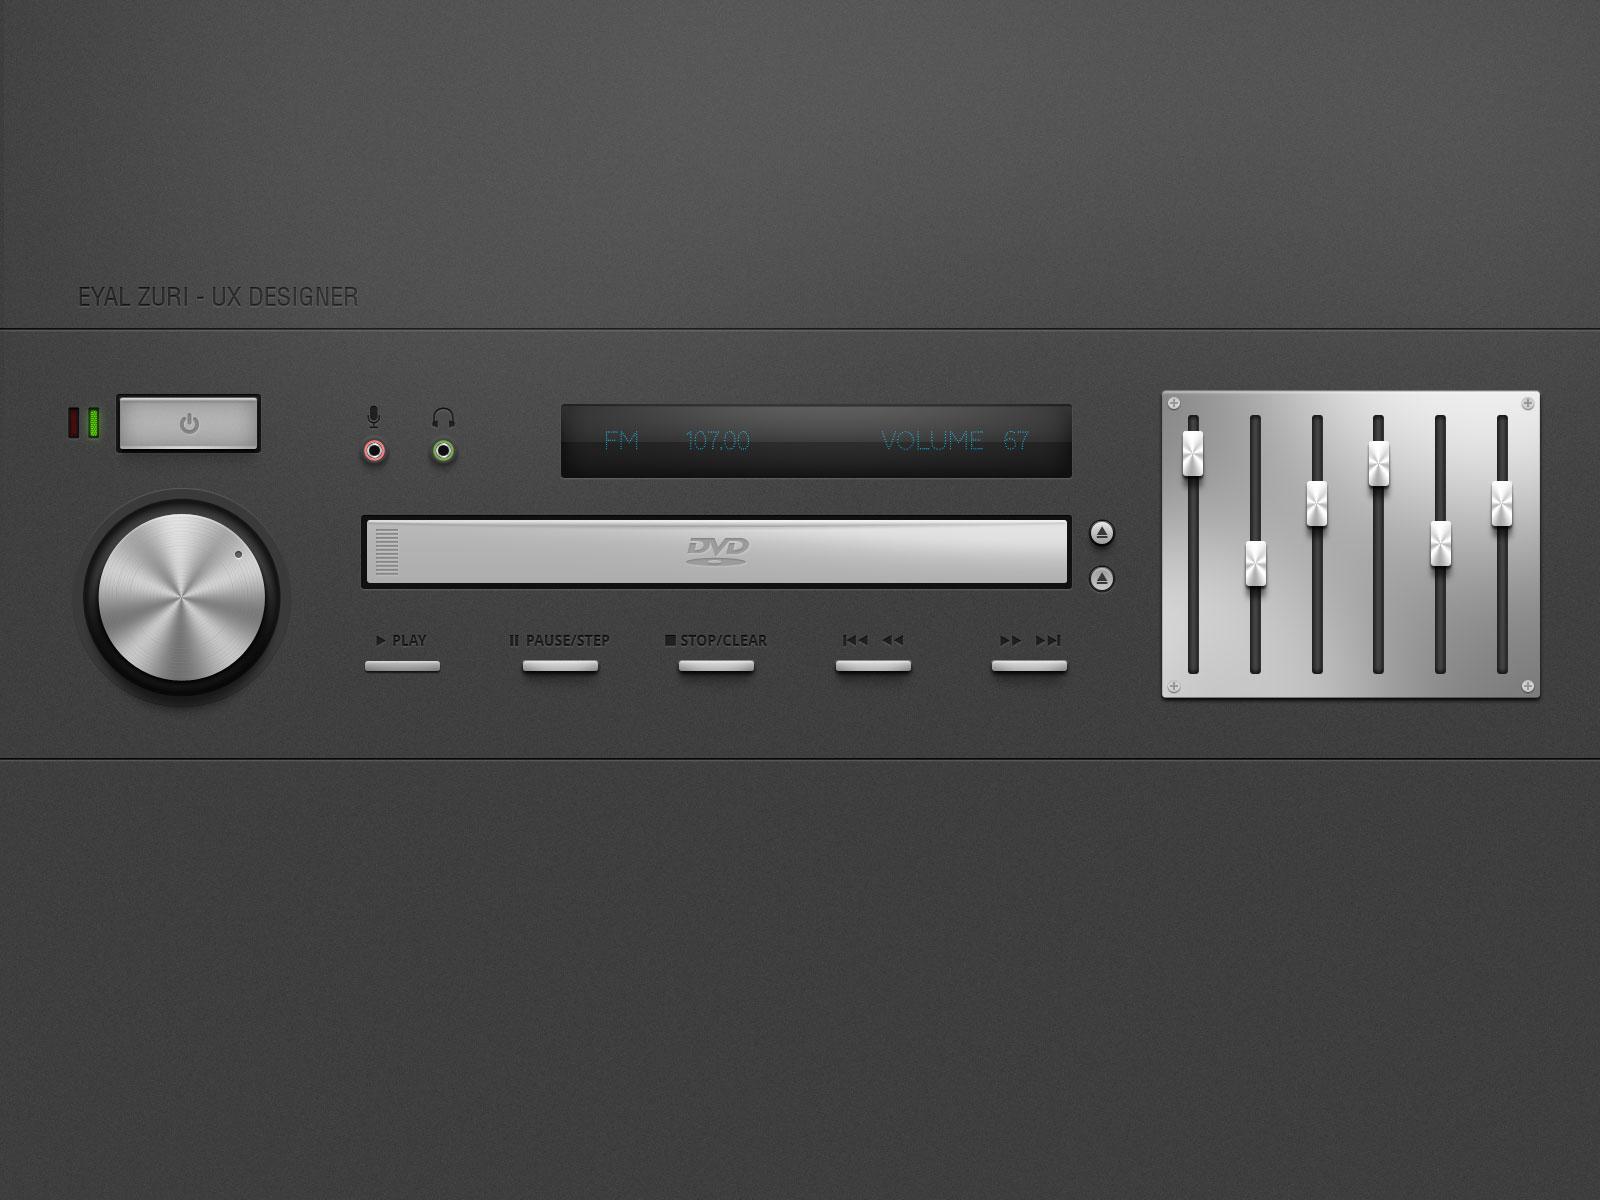 DVD Player Panel Knobs Equalizer PSD Mockup